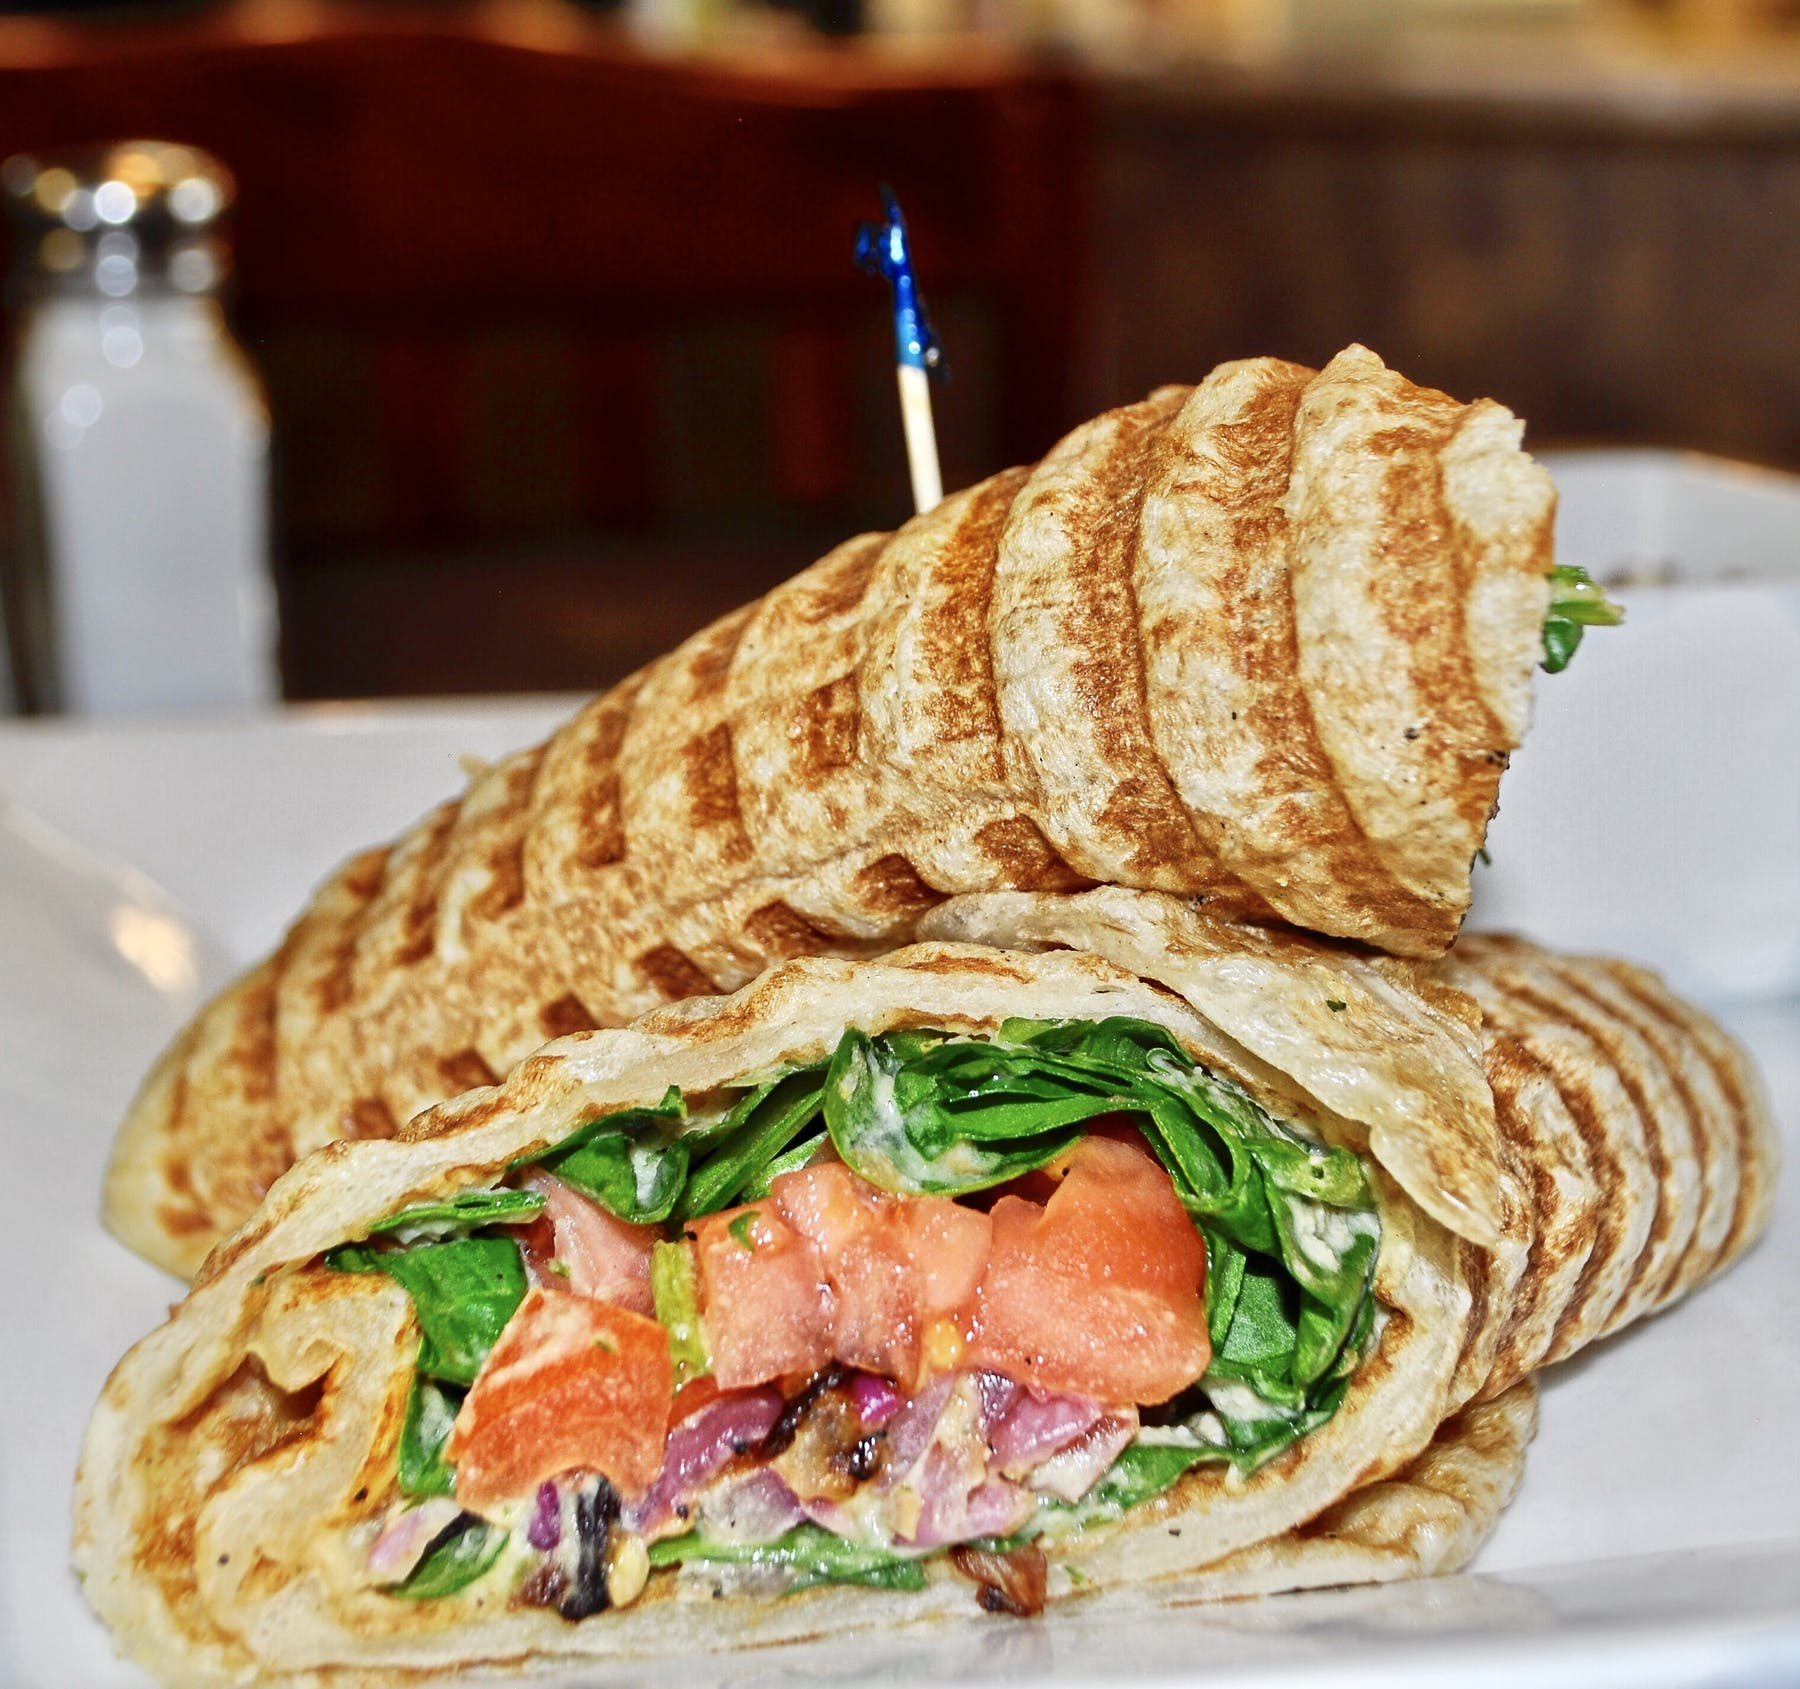 a close up of a vegan sandwich on a plate